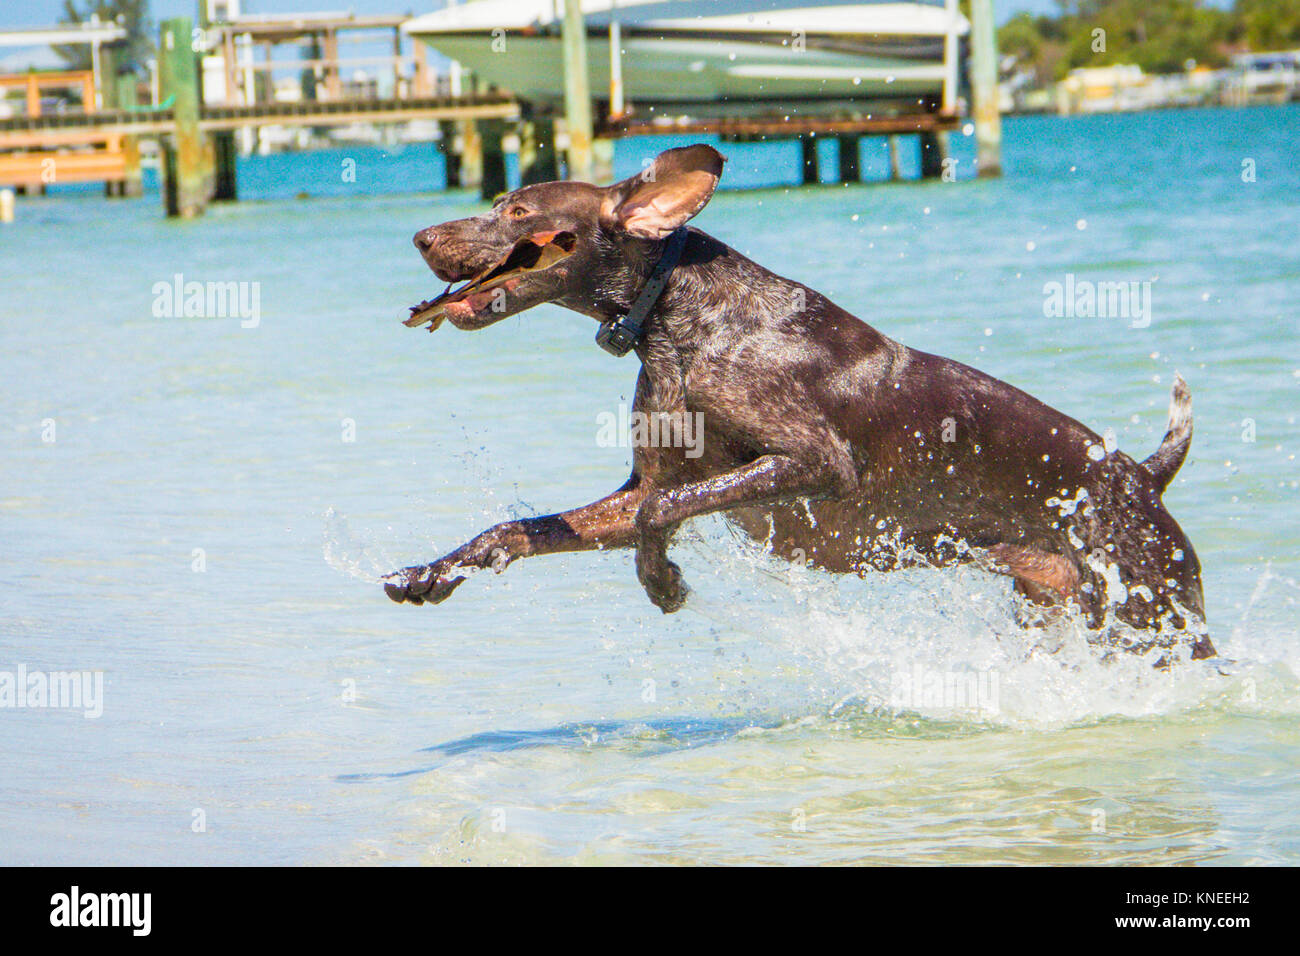 German Shorthaired Pointer Dog Running Stock Photos & German ...